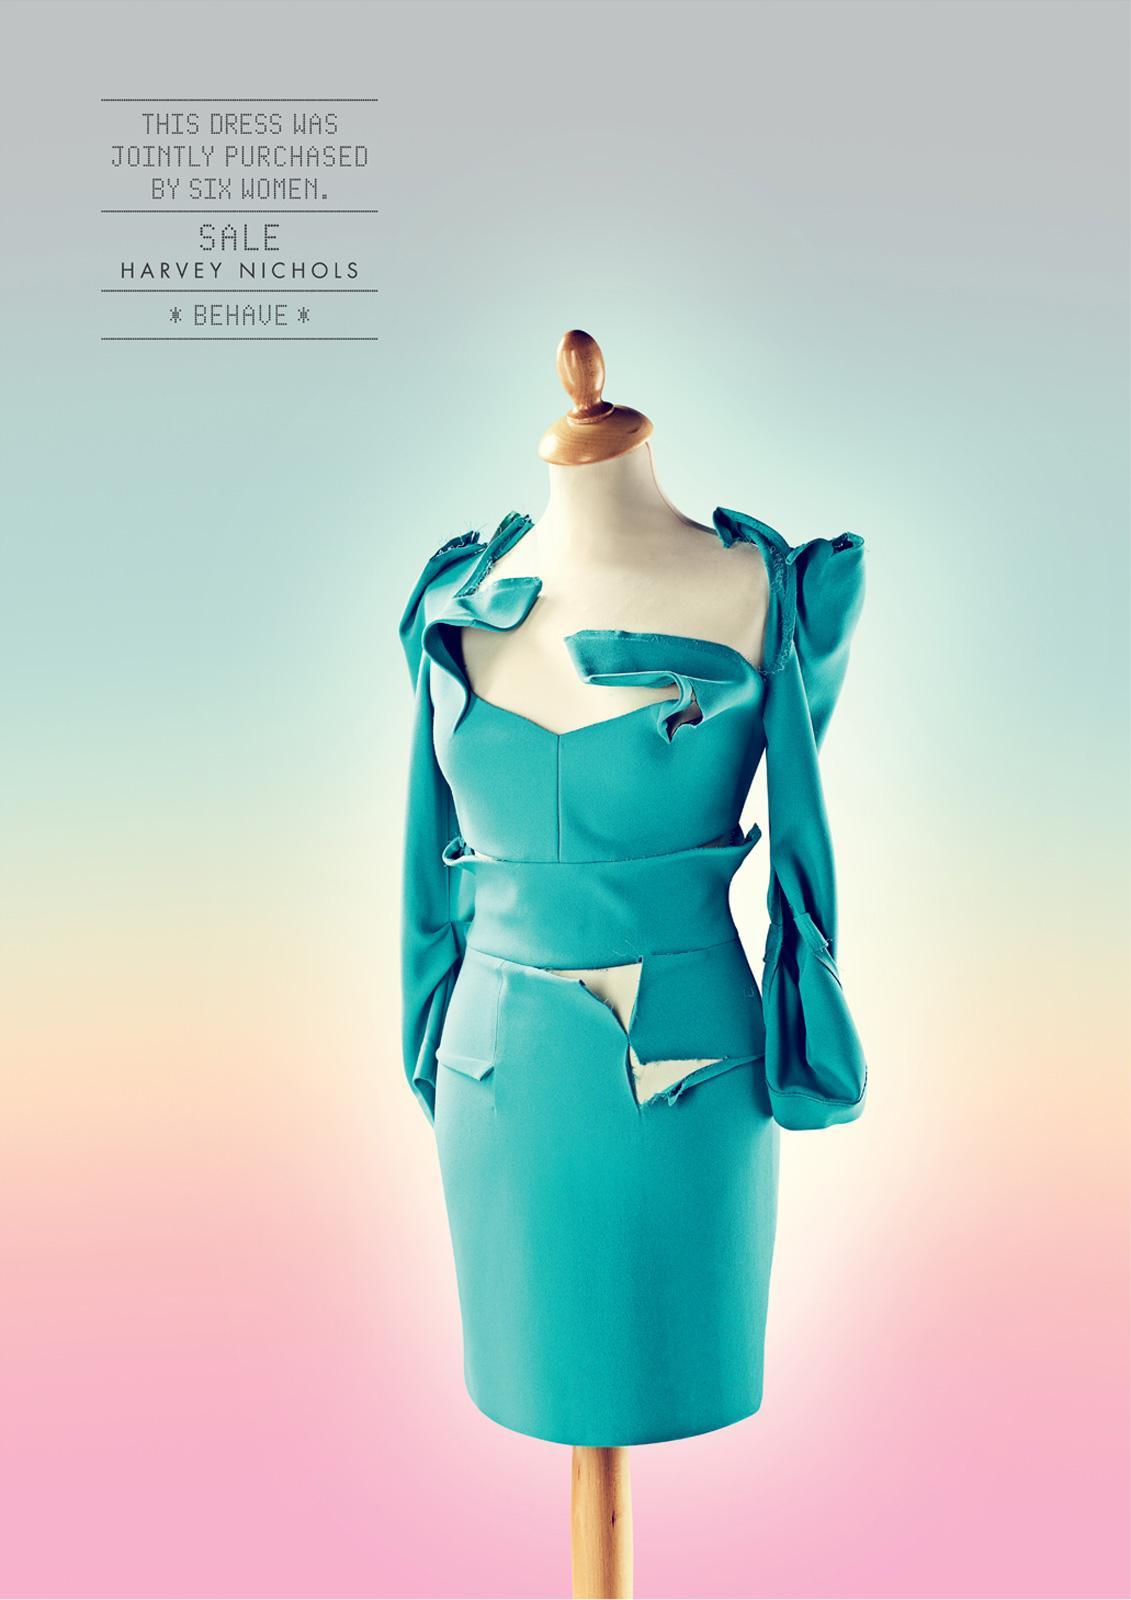 Harvey Nichols Print Ad -  Behave, Dress